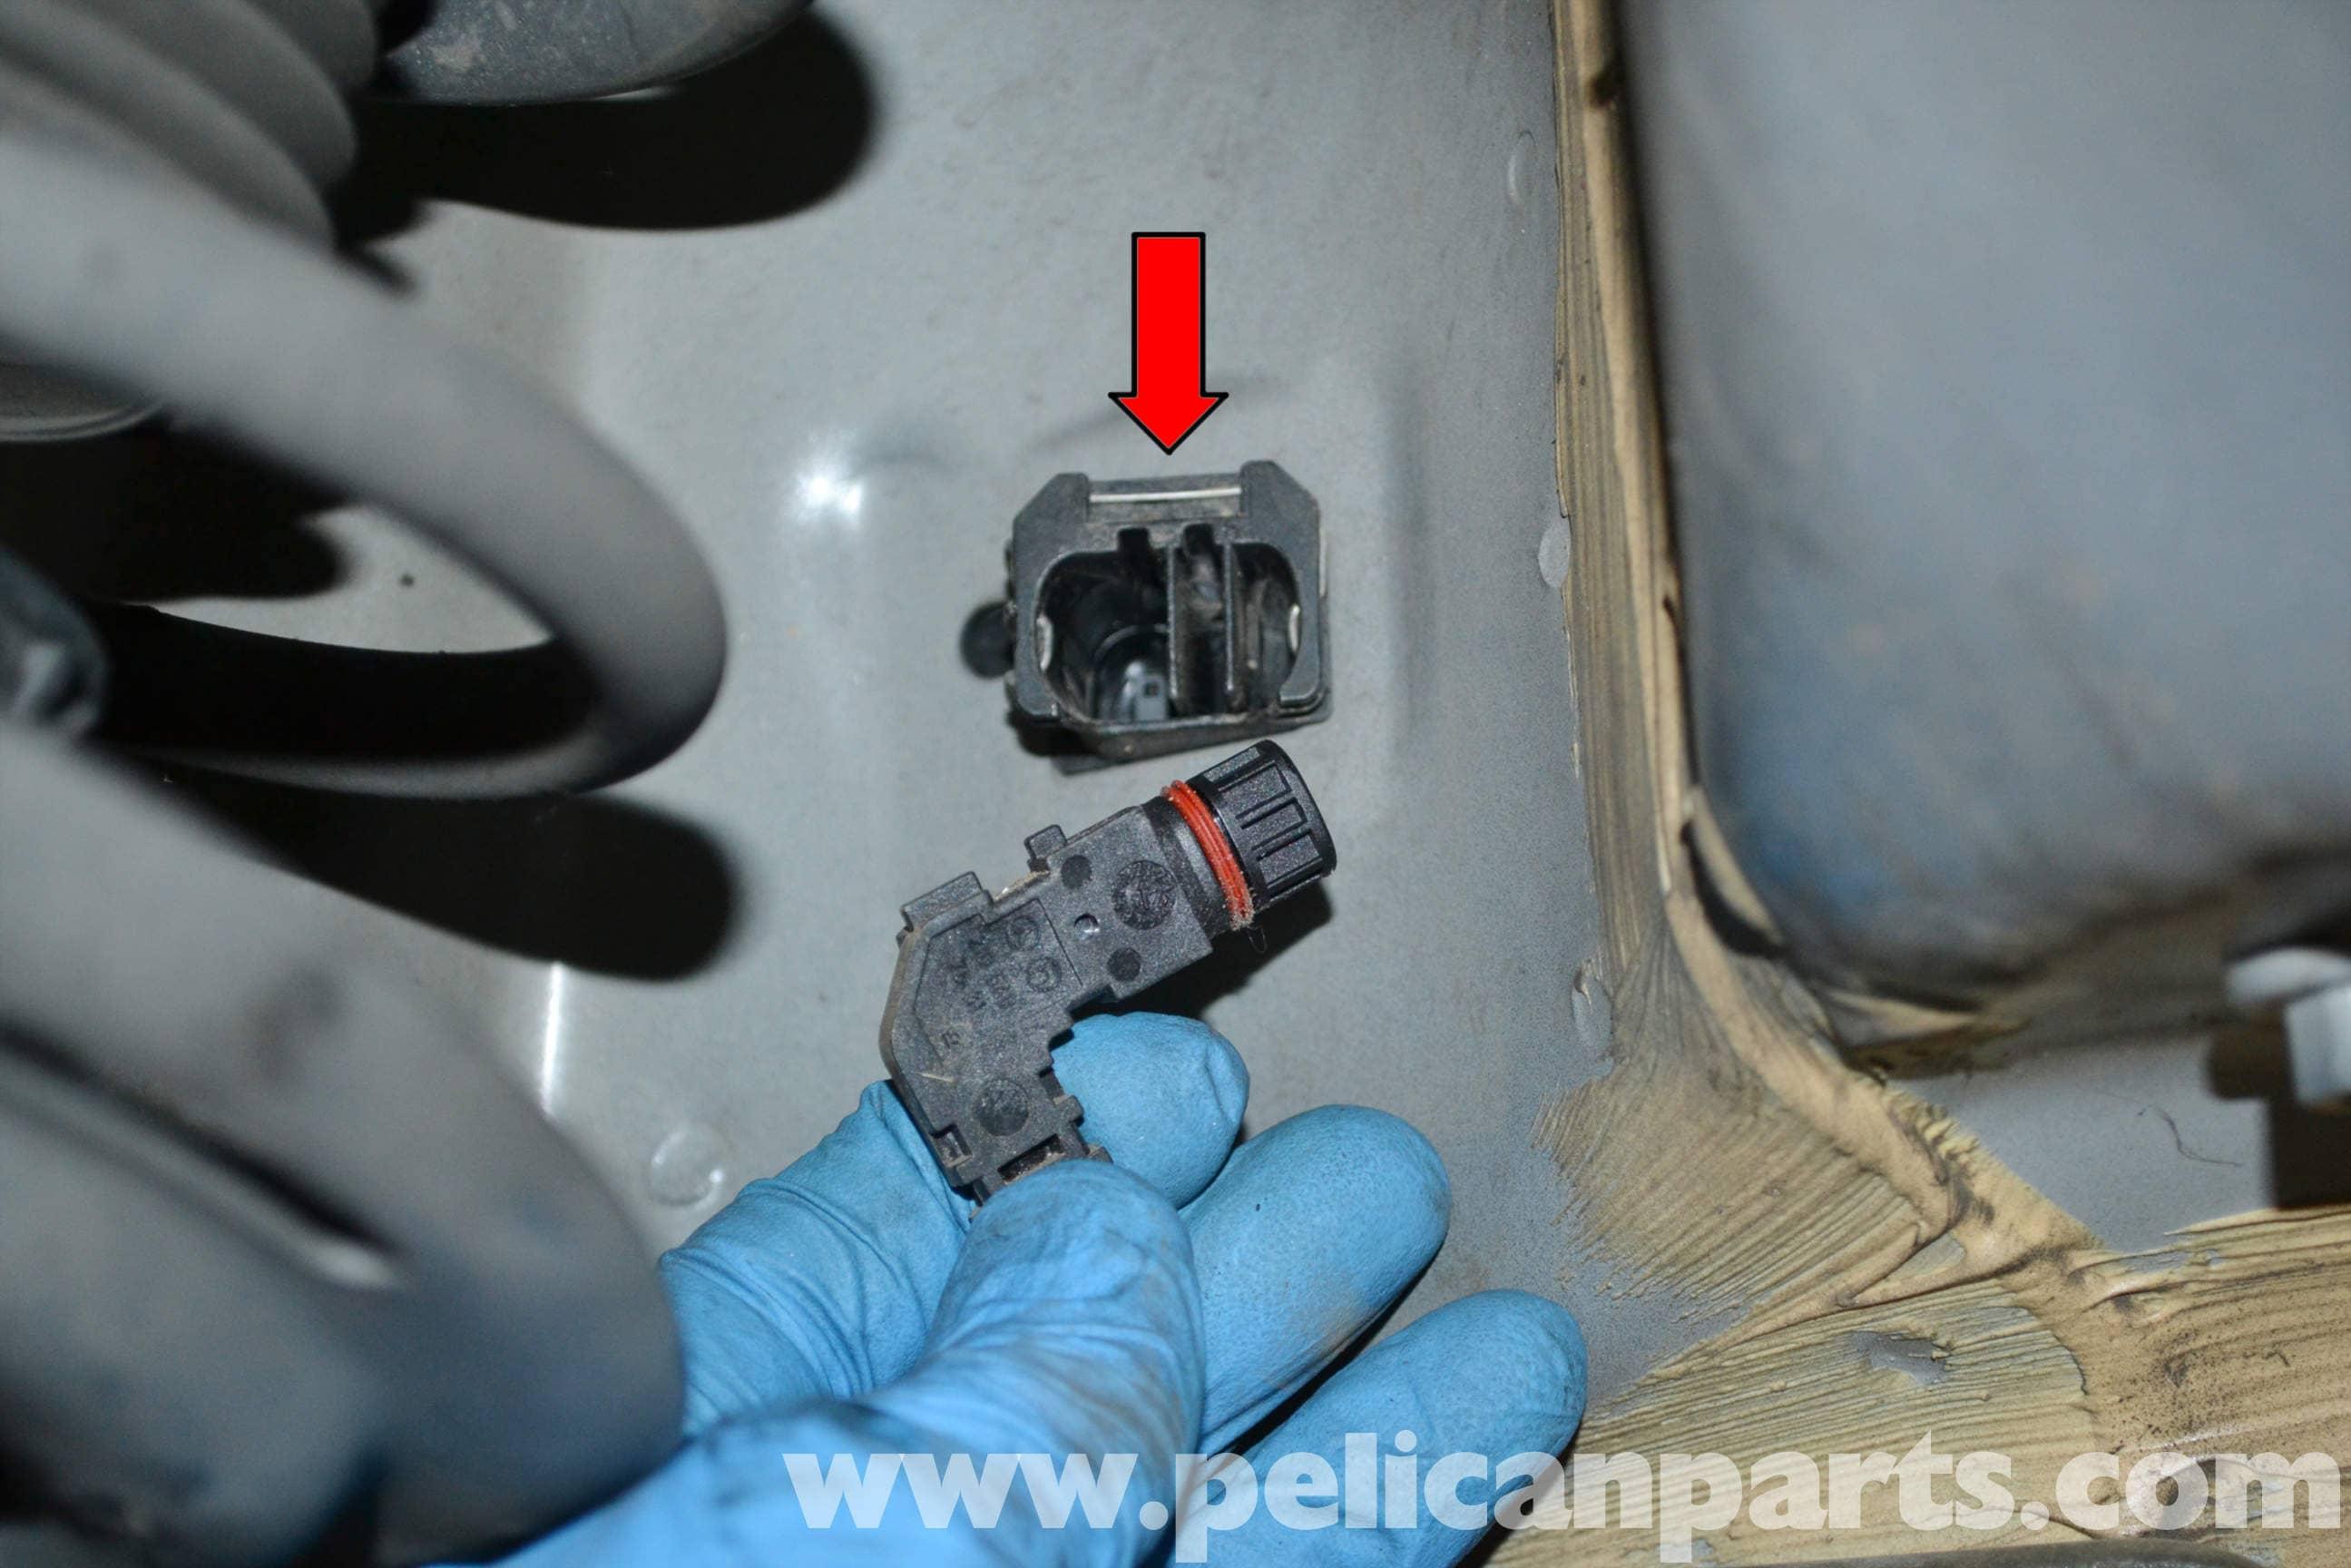 Mercedes benz w204 abs wheel speed sensor replacement for Mercedes benz installing parking sensors aftermarket